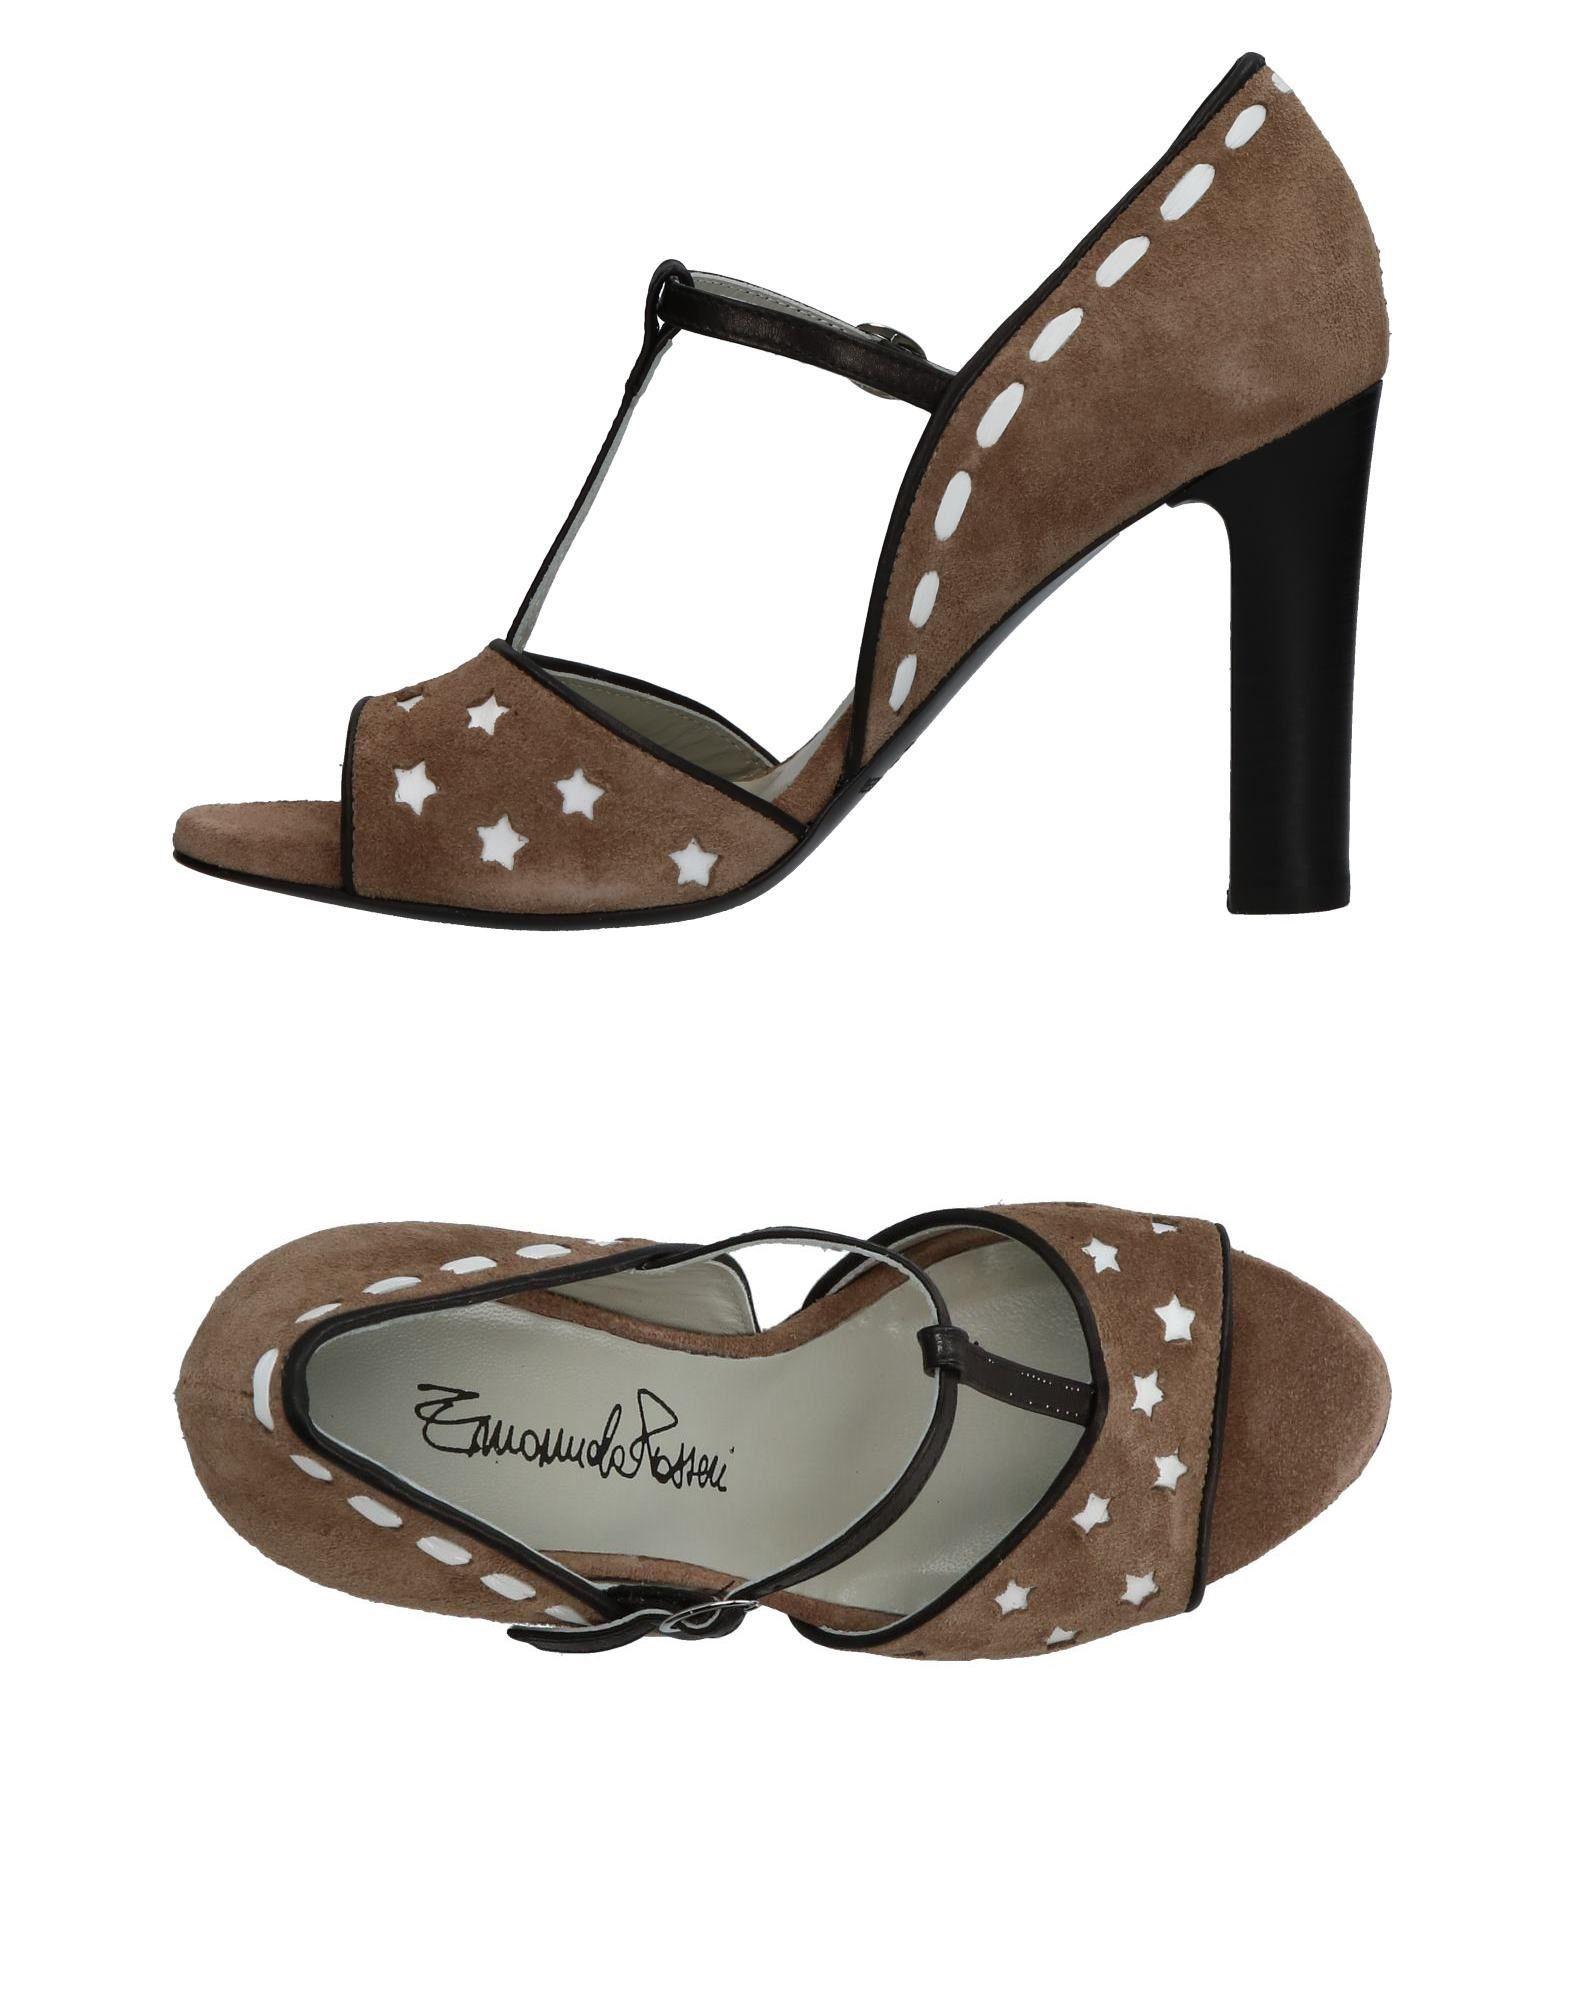 Emanuela Passeri Sandalen Damen  11331623FV Gute Qualität beliebte Schuhe